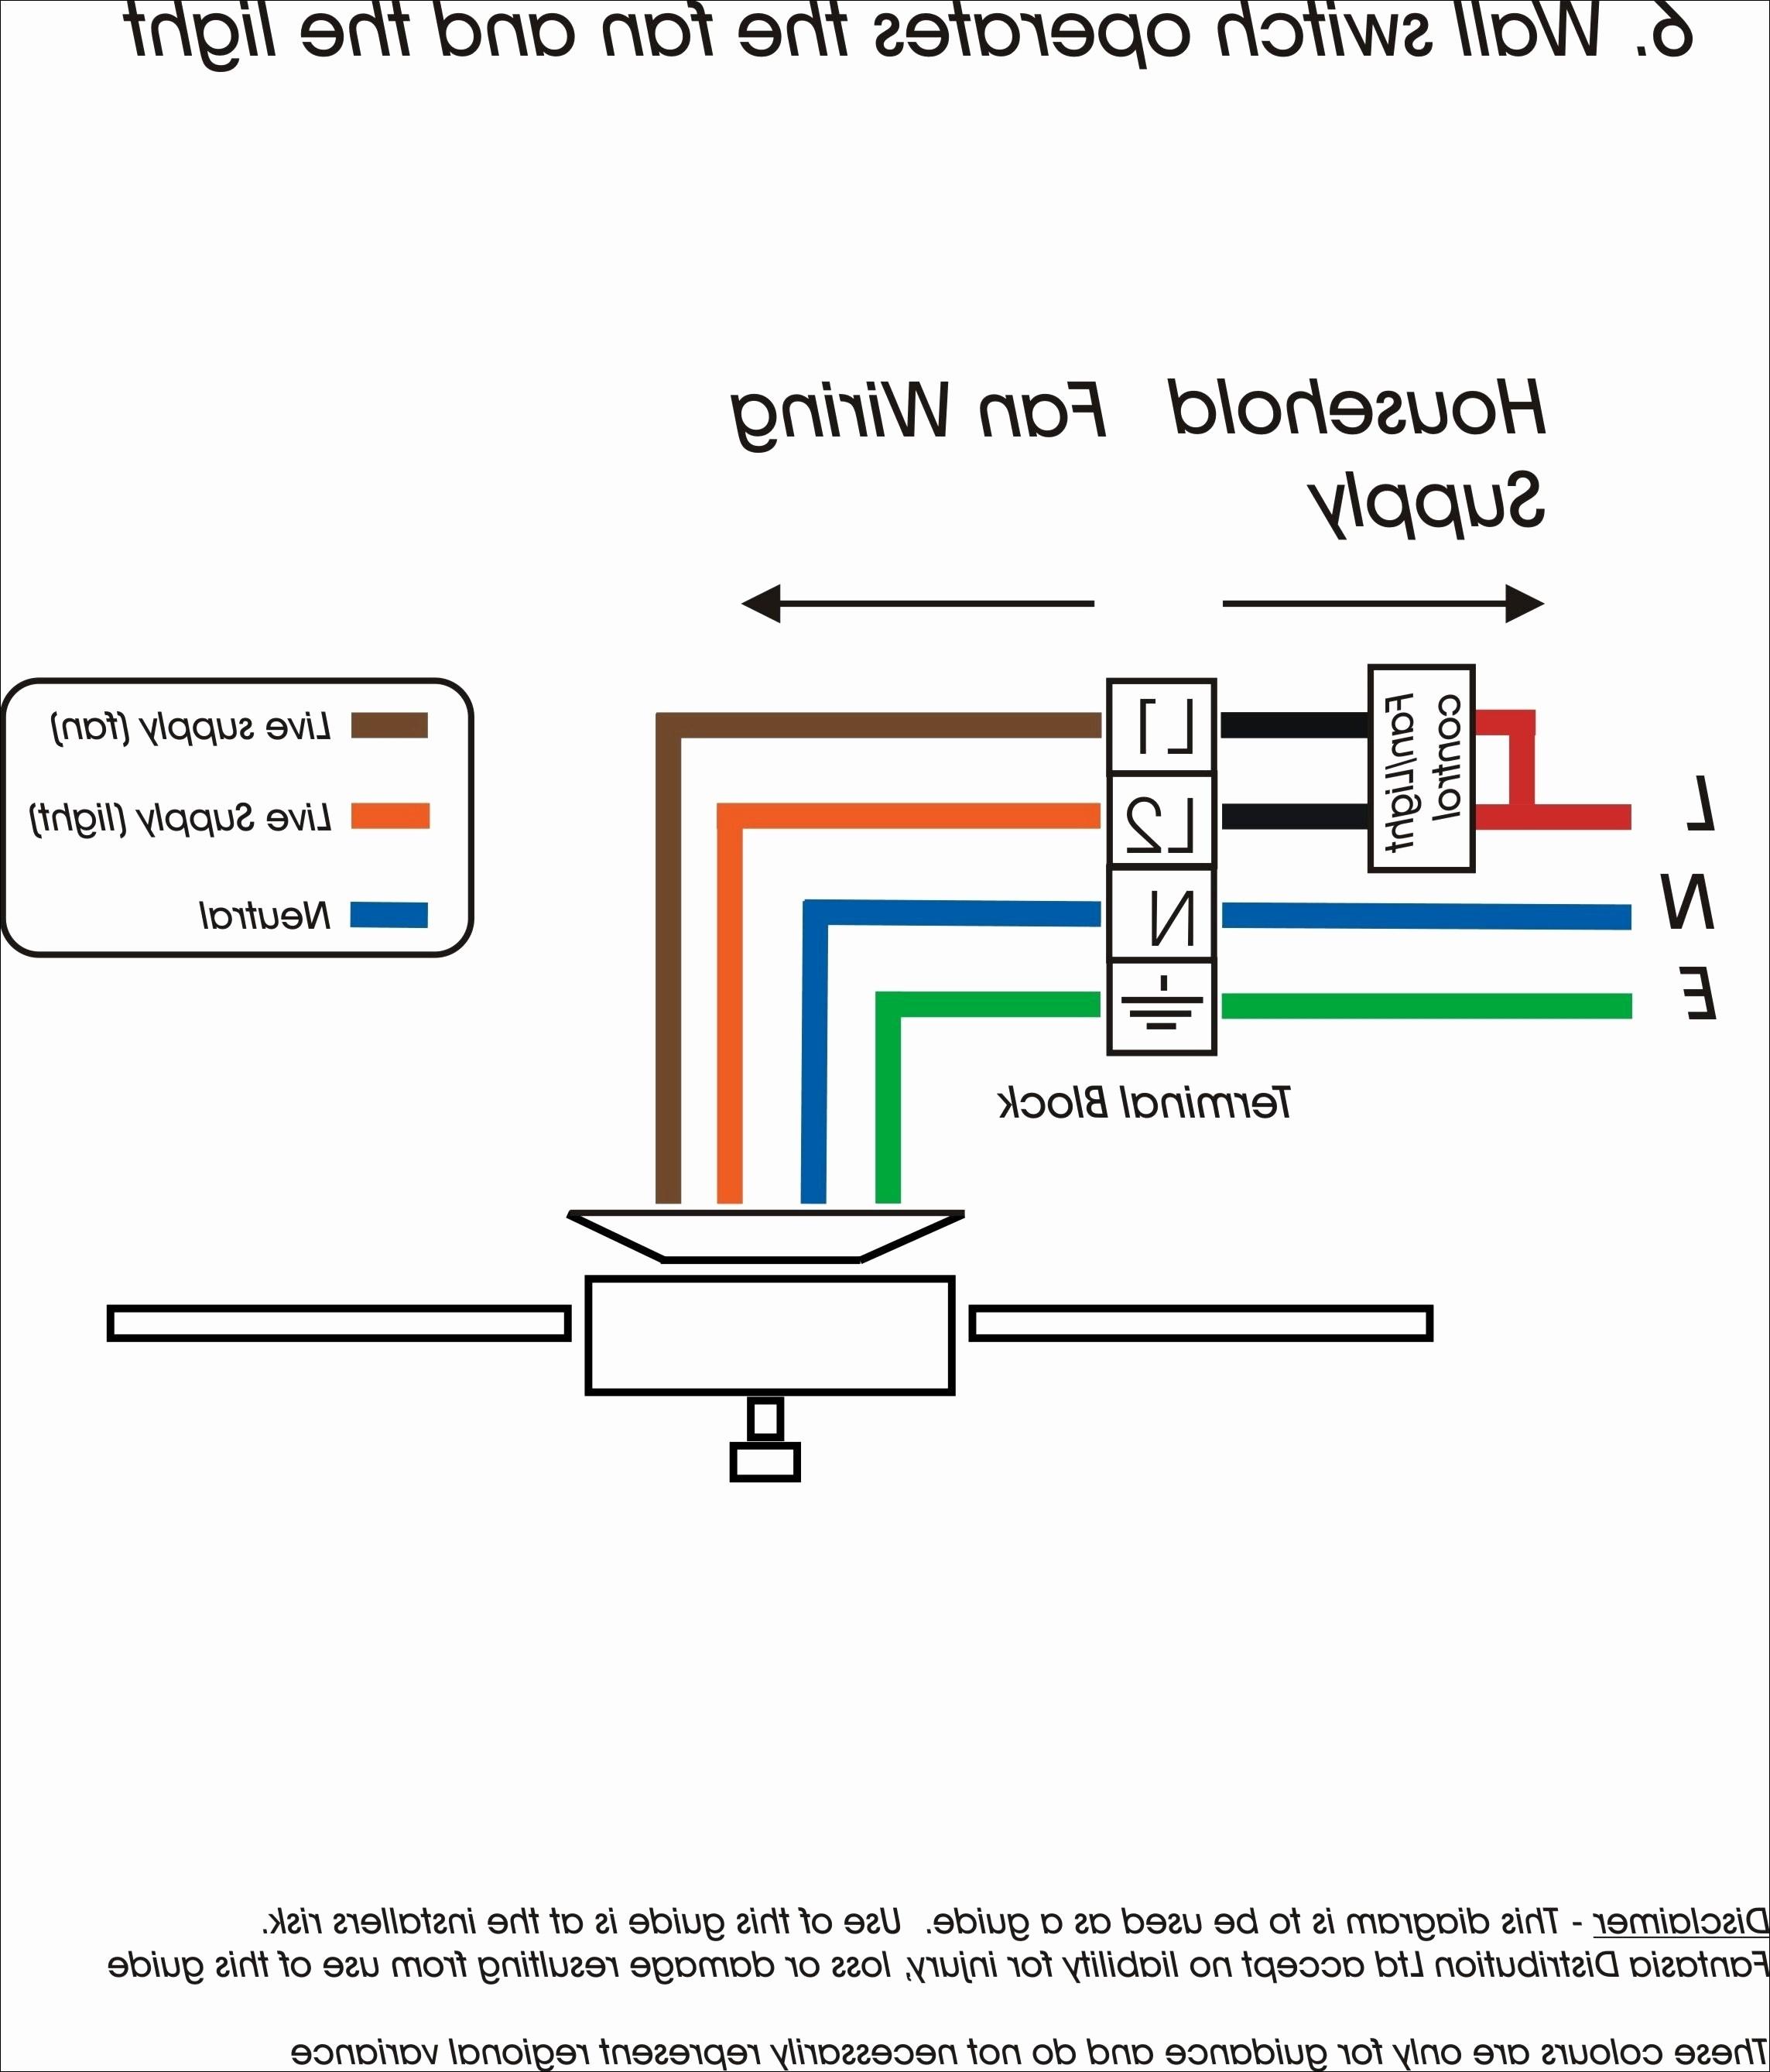 Generac Manual Transfer Switch Wiring Diagram New Generac Manual Generac 6333 Wiring Diagram